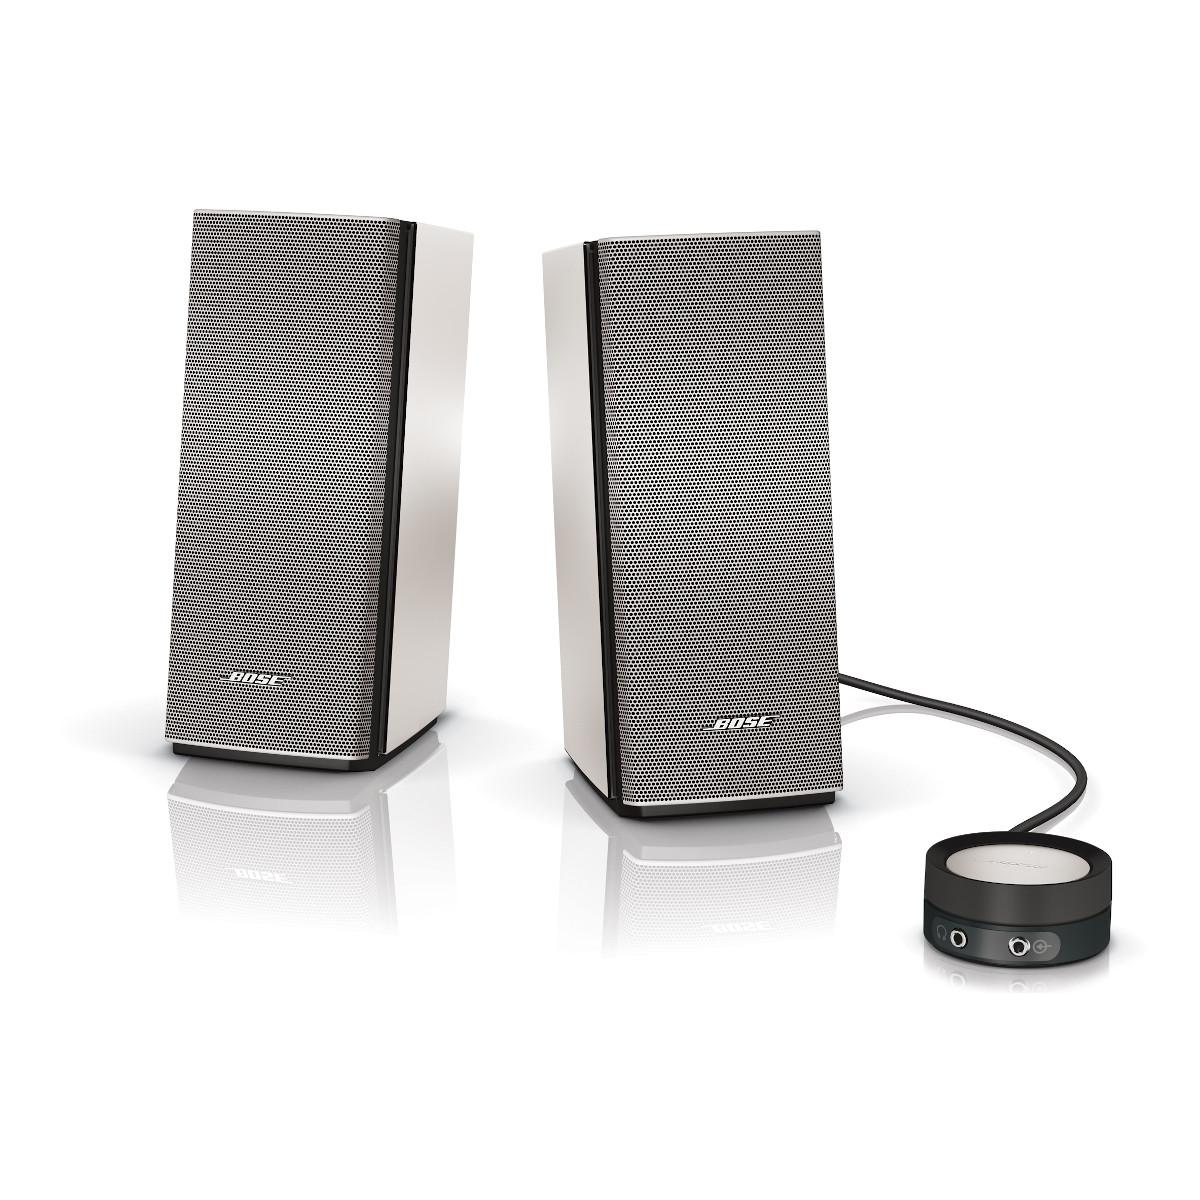 Bose Car Sound System Ebay: Bose Companion 20 Multimedia Speaker System (Silver)